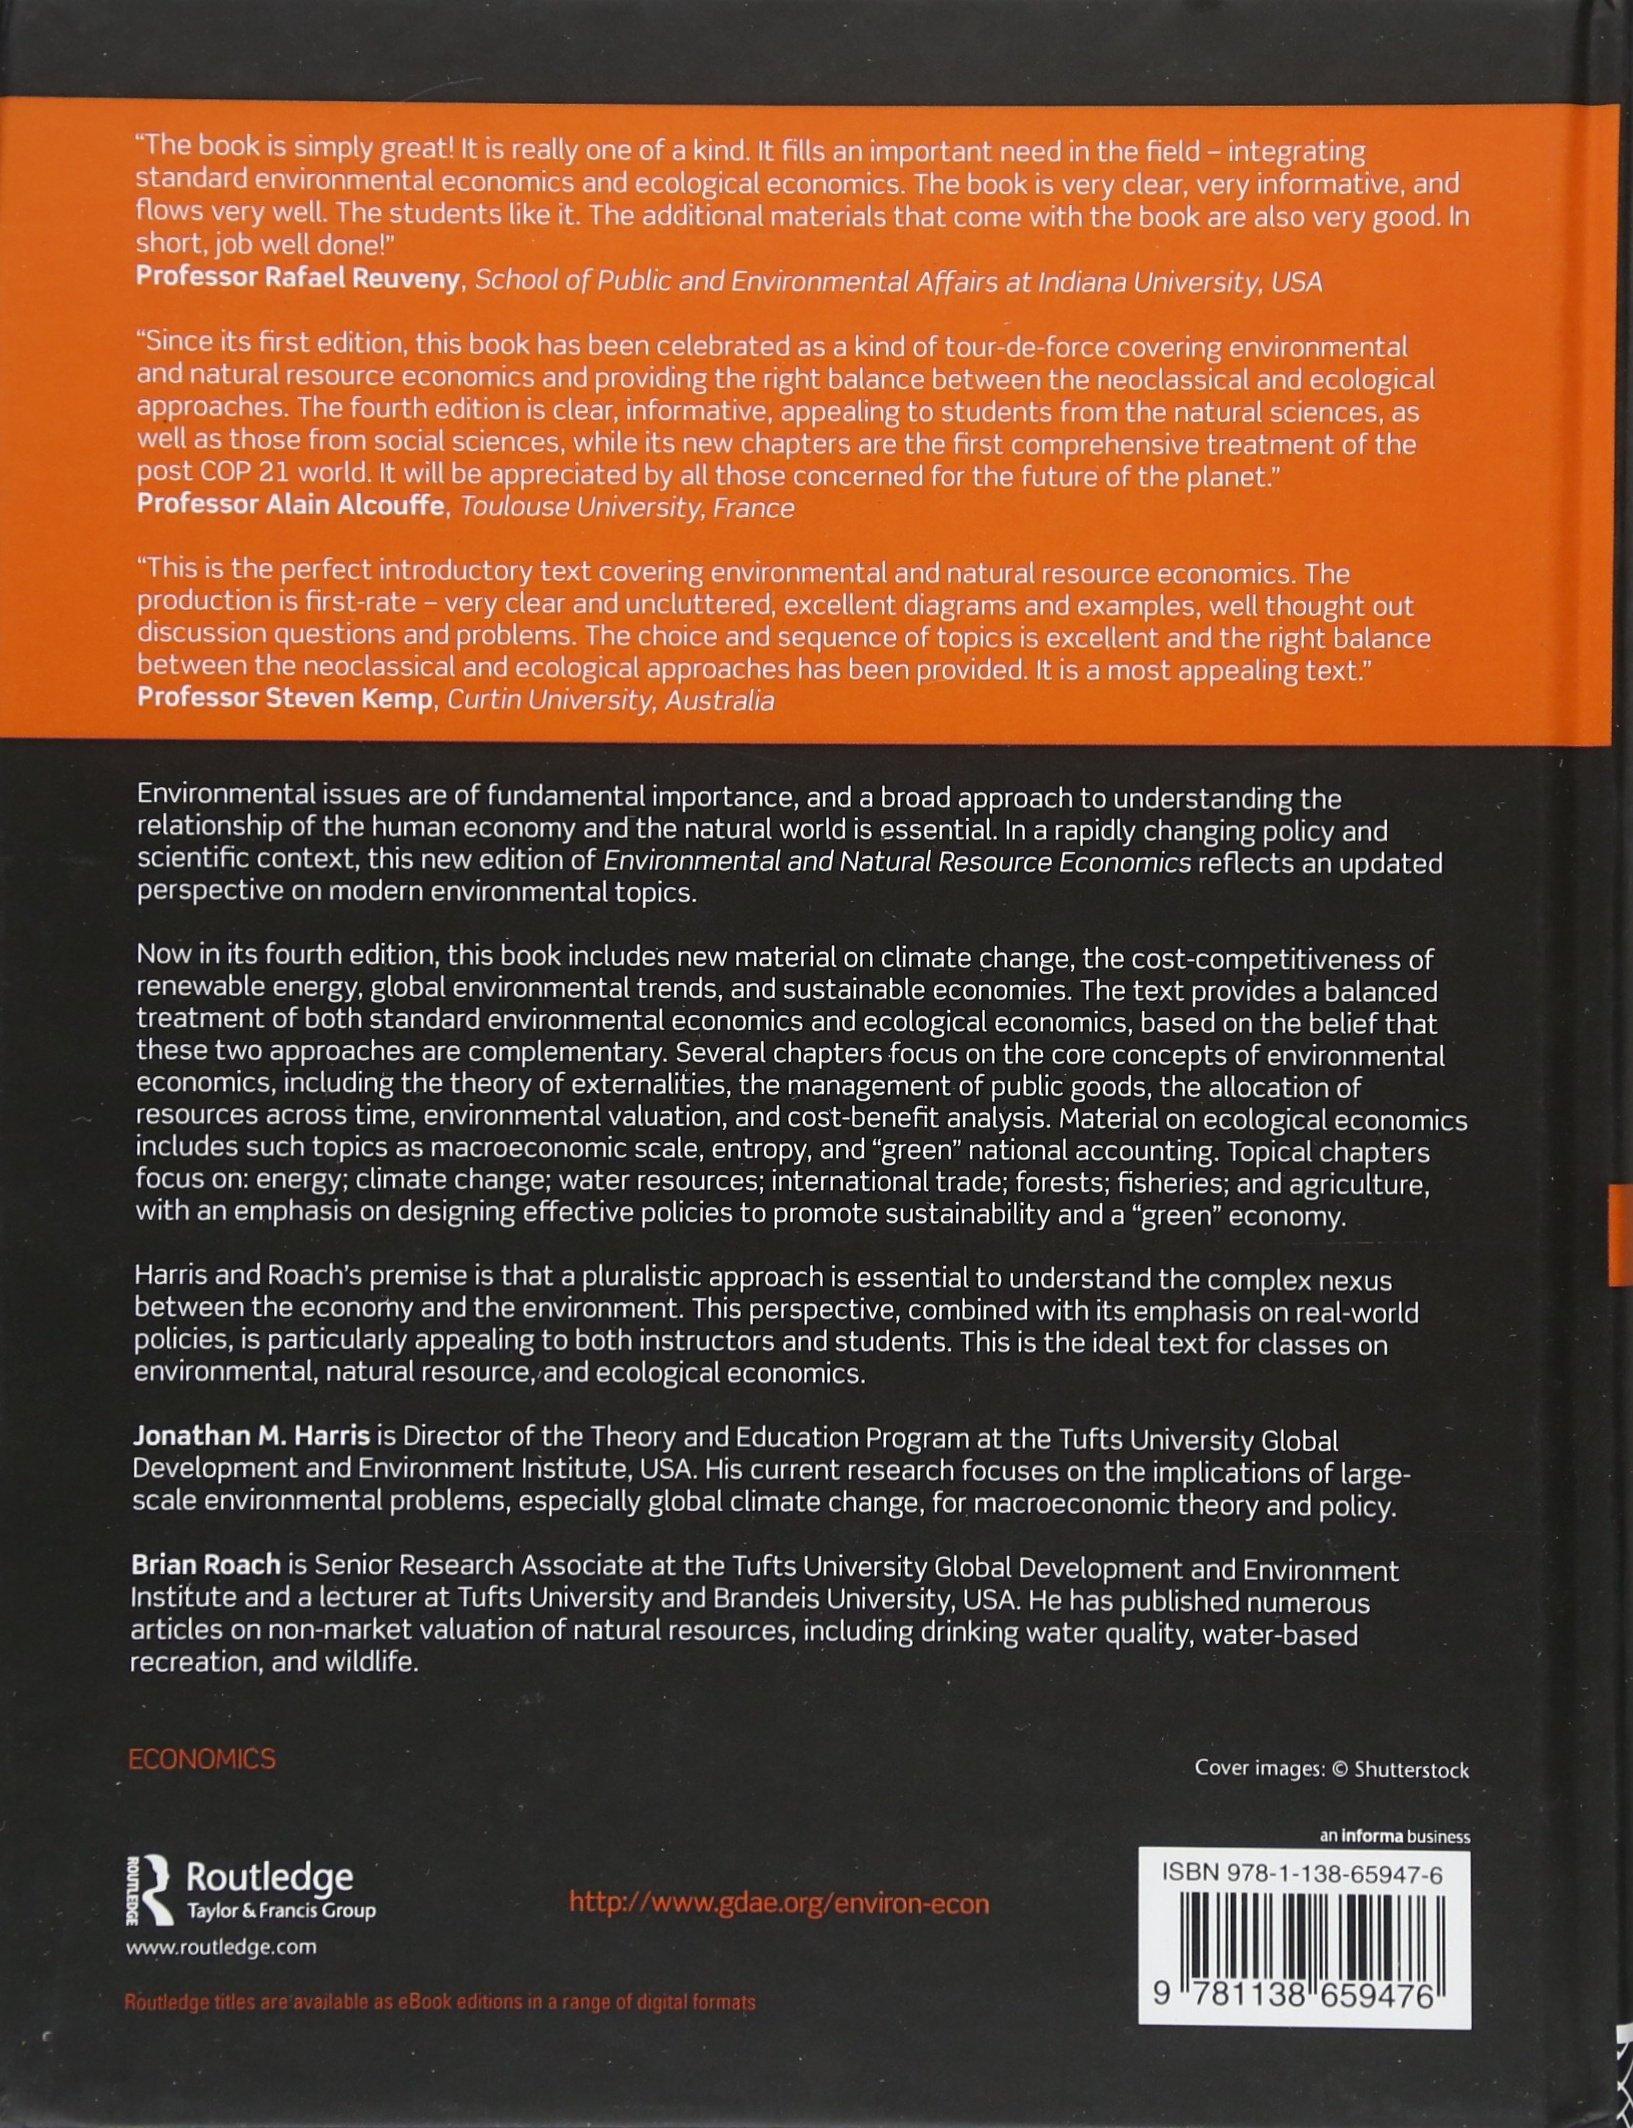 Environmental and Natural Resource Economics A Contemporary